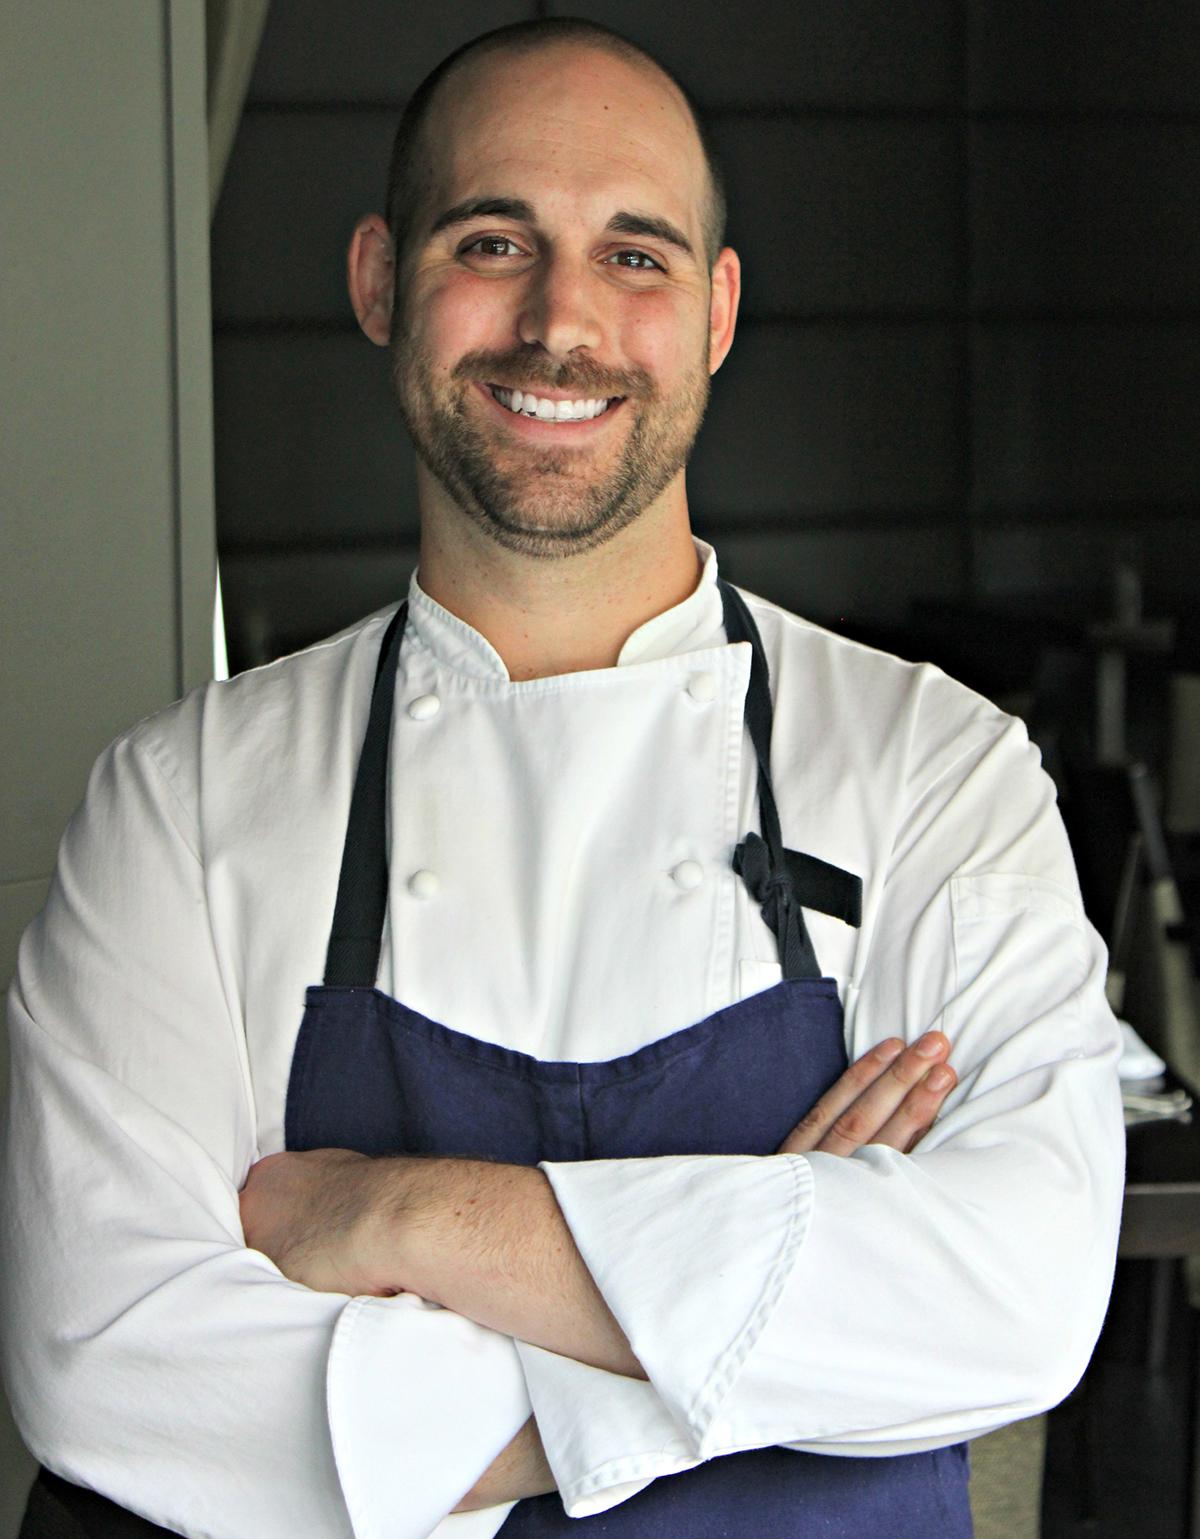 Deuxave chef de cuisine Justin Urso